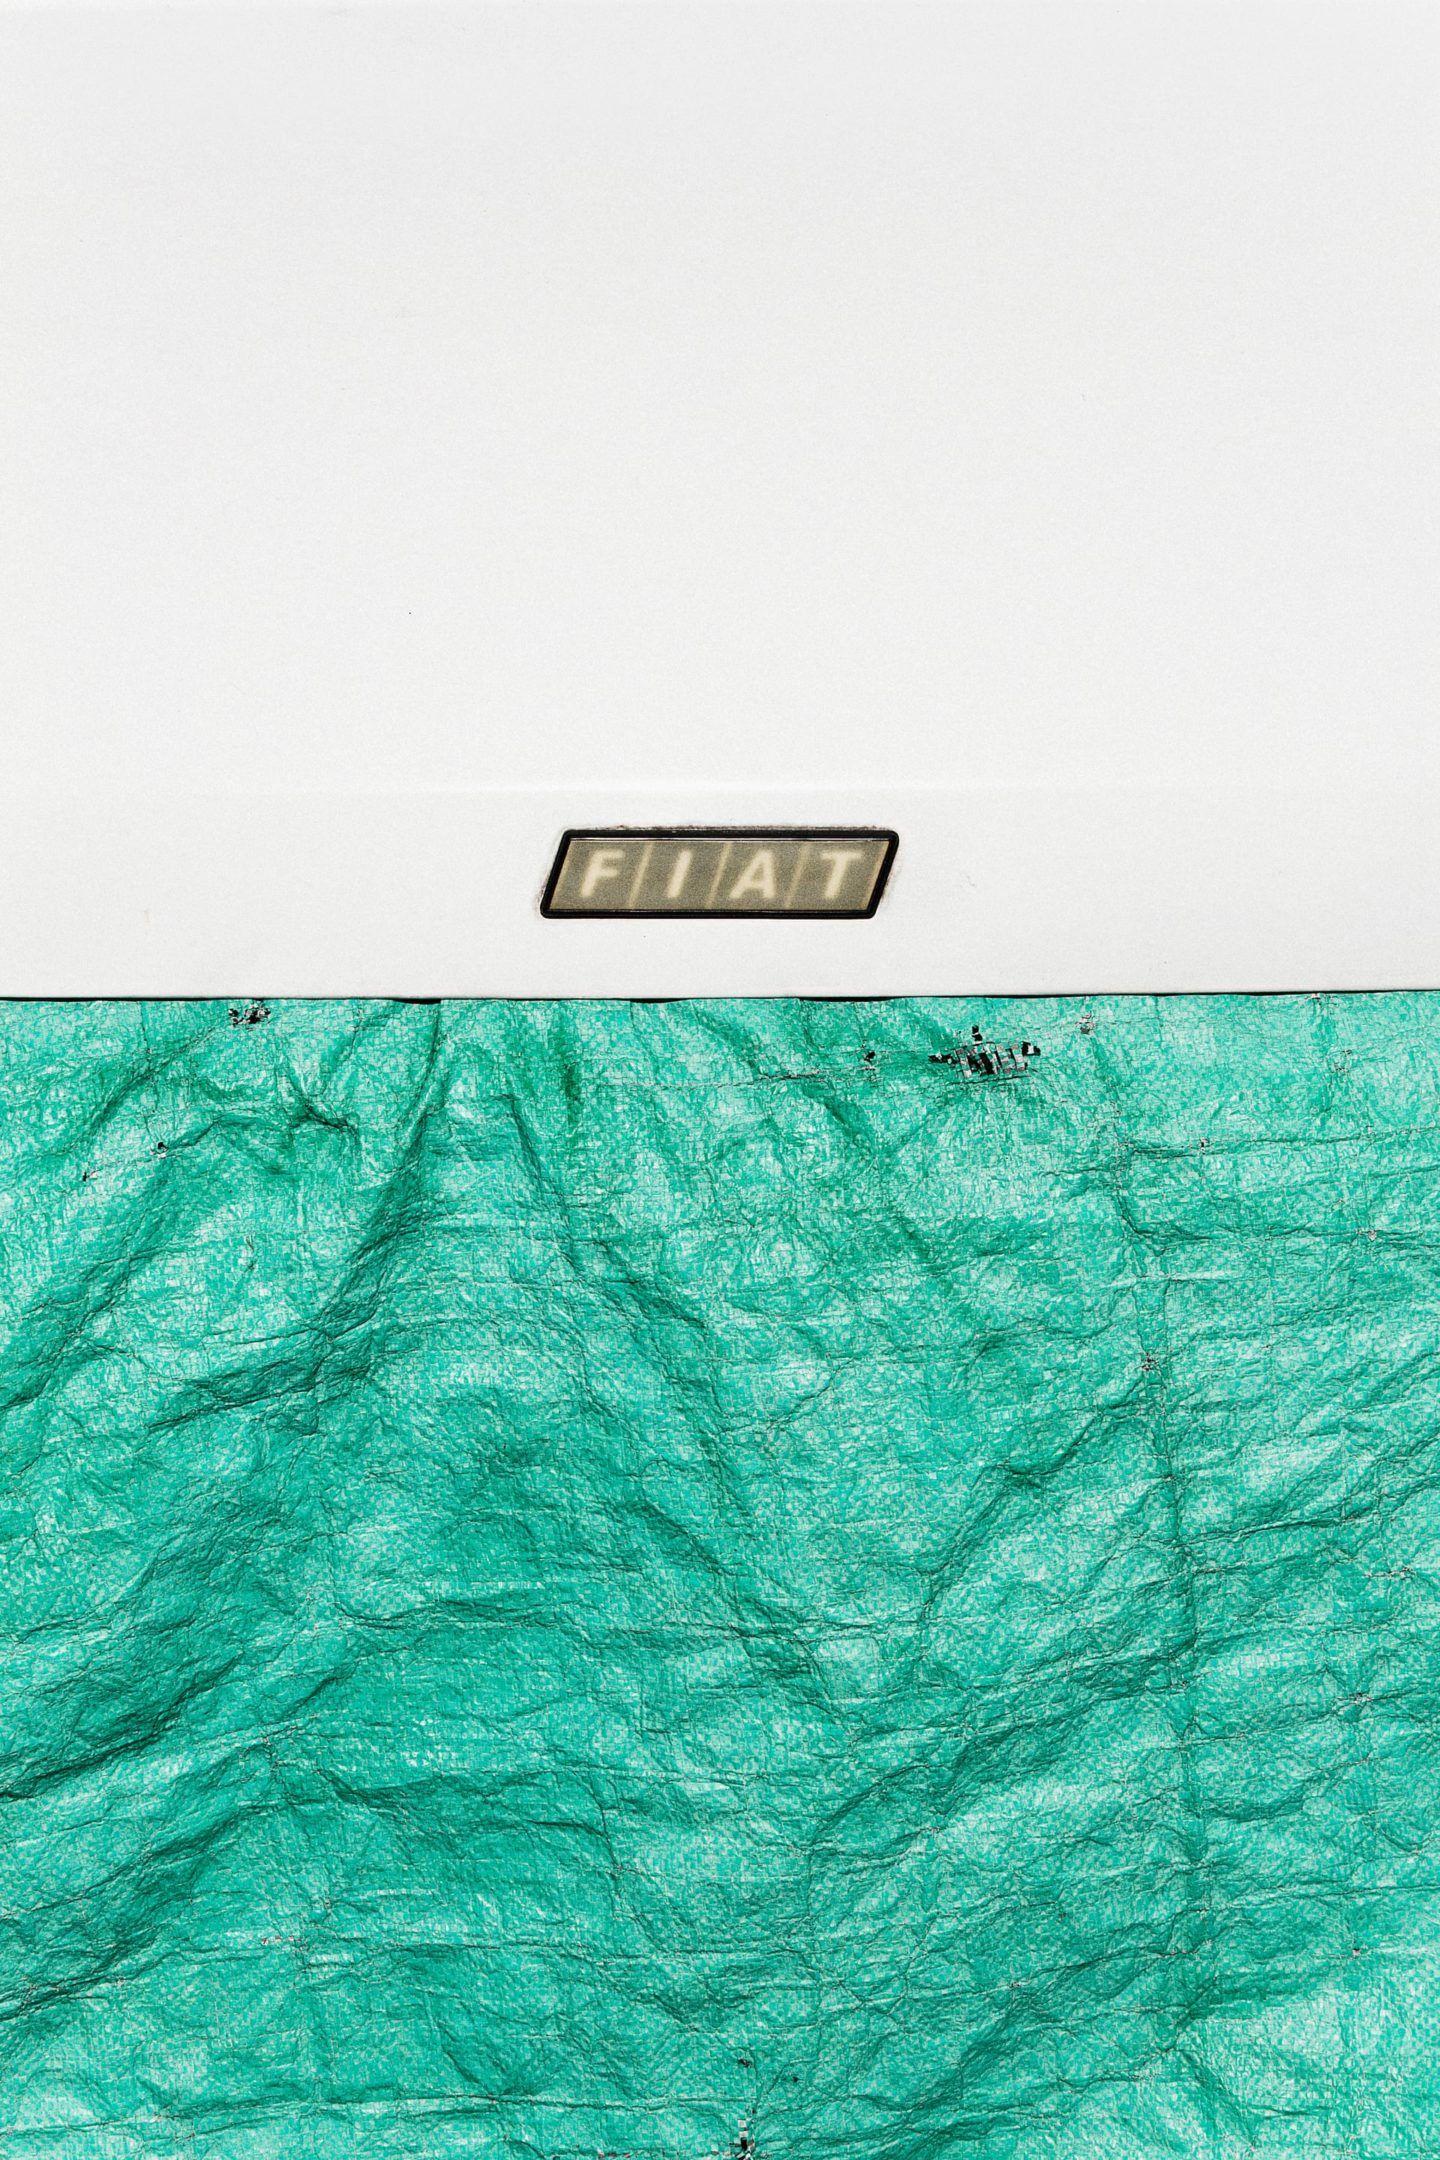 IGNANT-Print-Ronni-Campana-Badly-Repaired-Cars-009